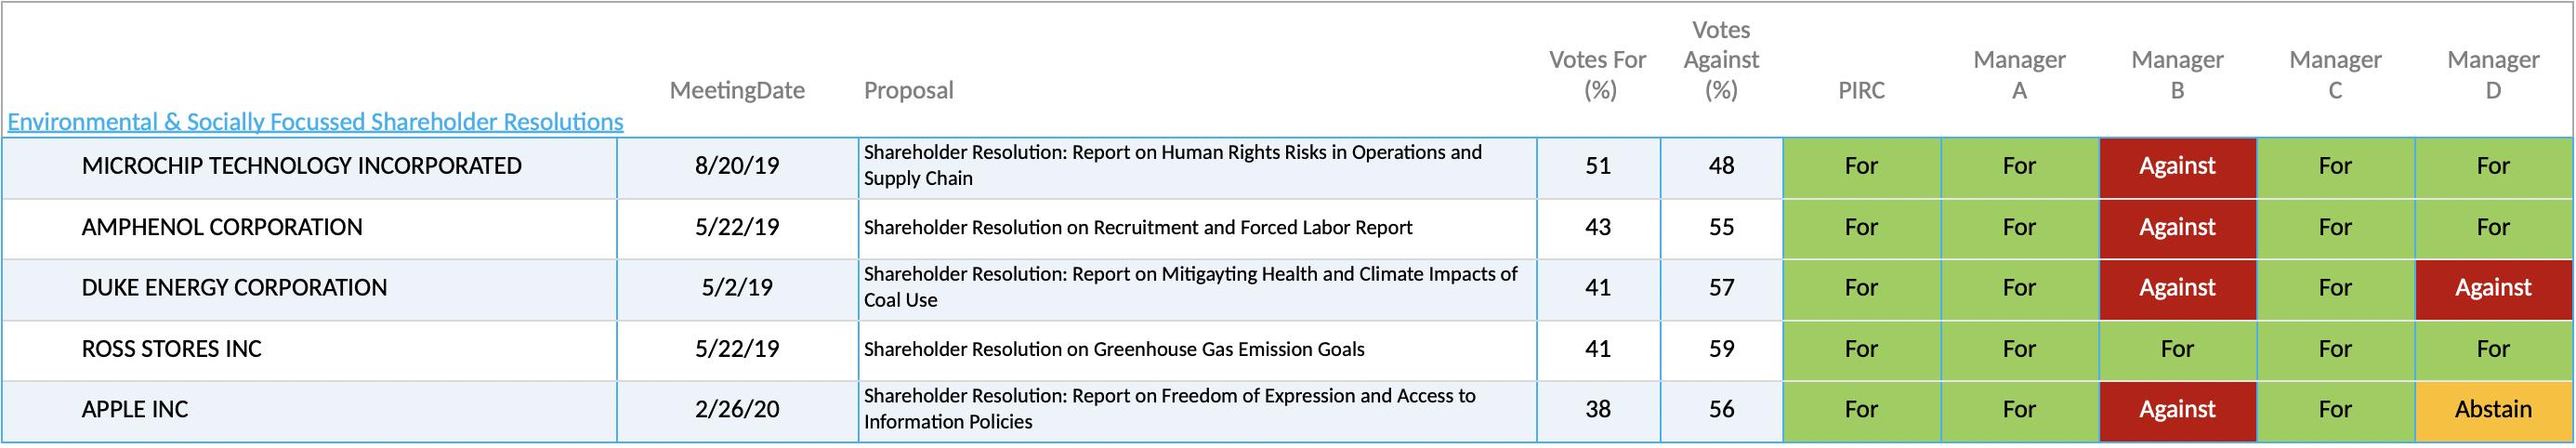 Environmental & Socially Focussed Shareholder Resolutions